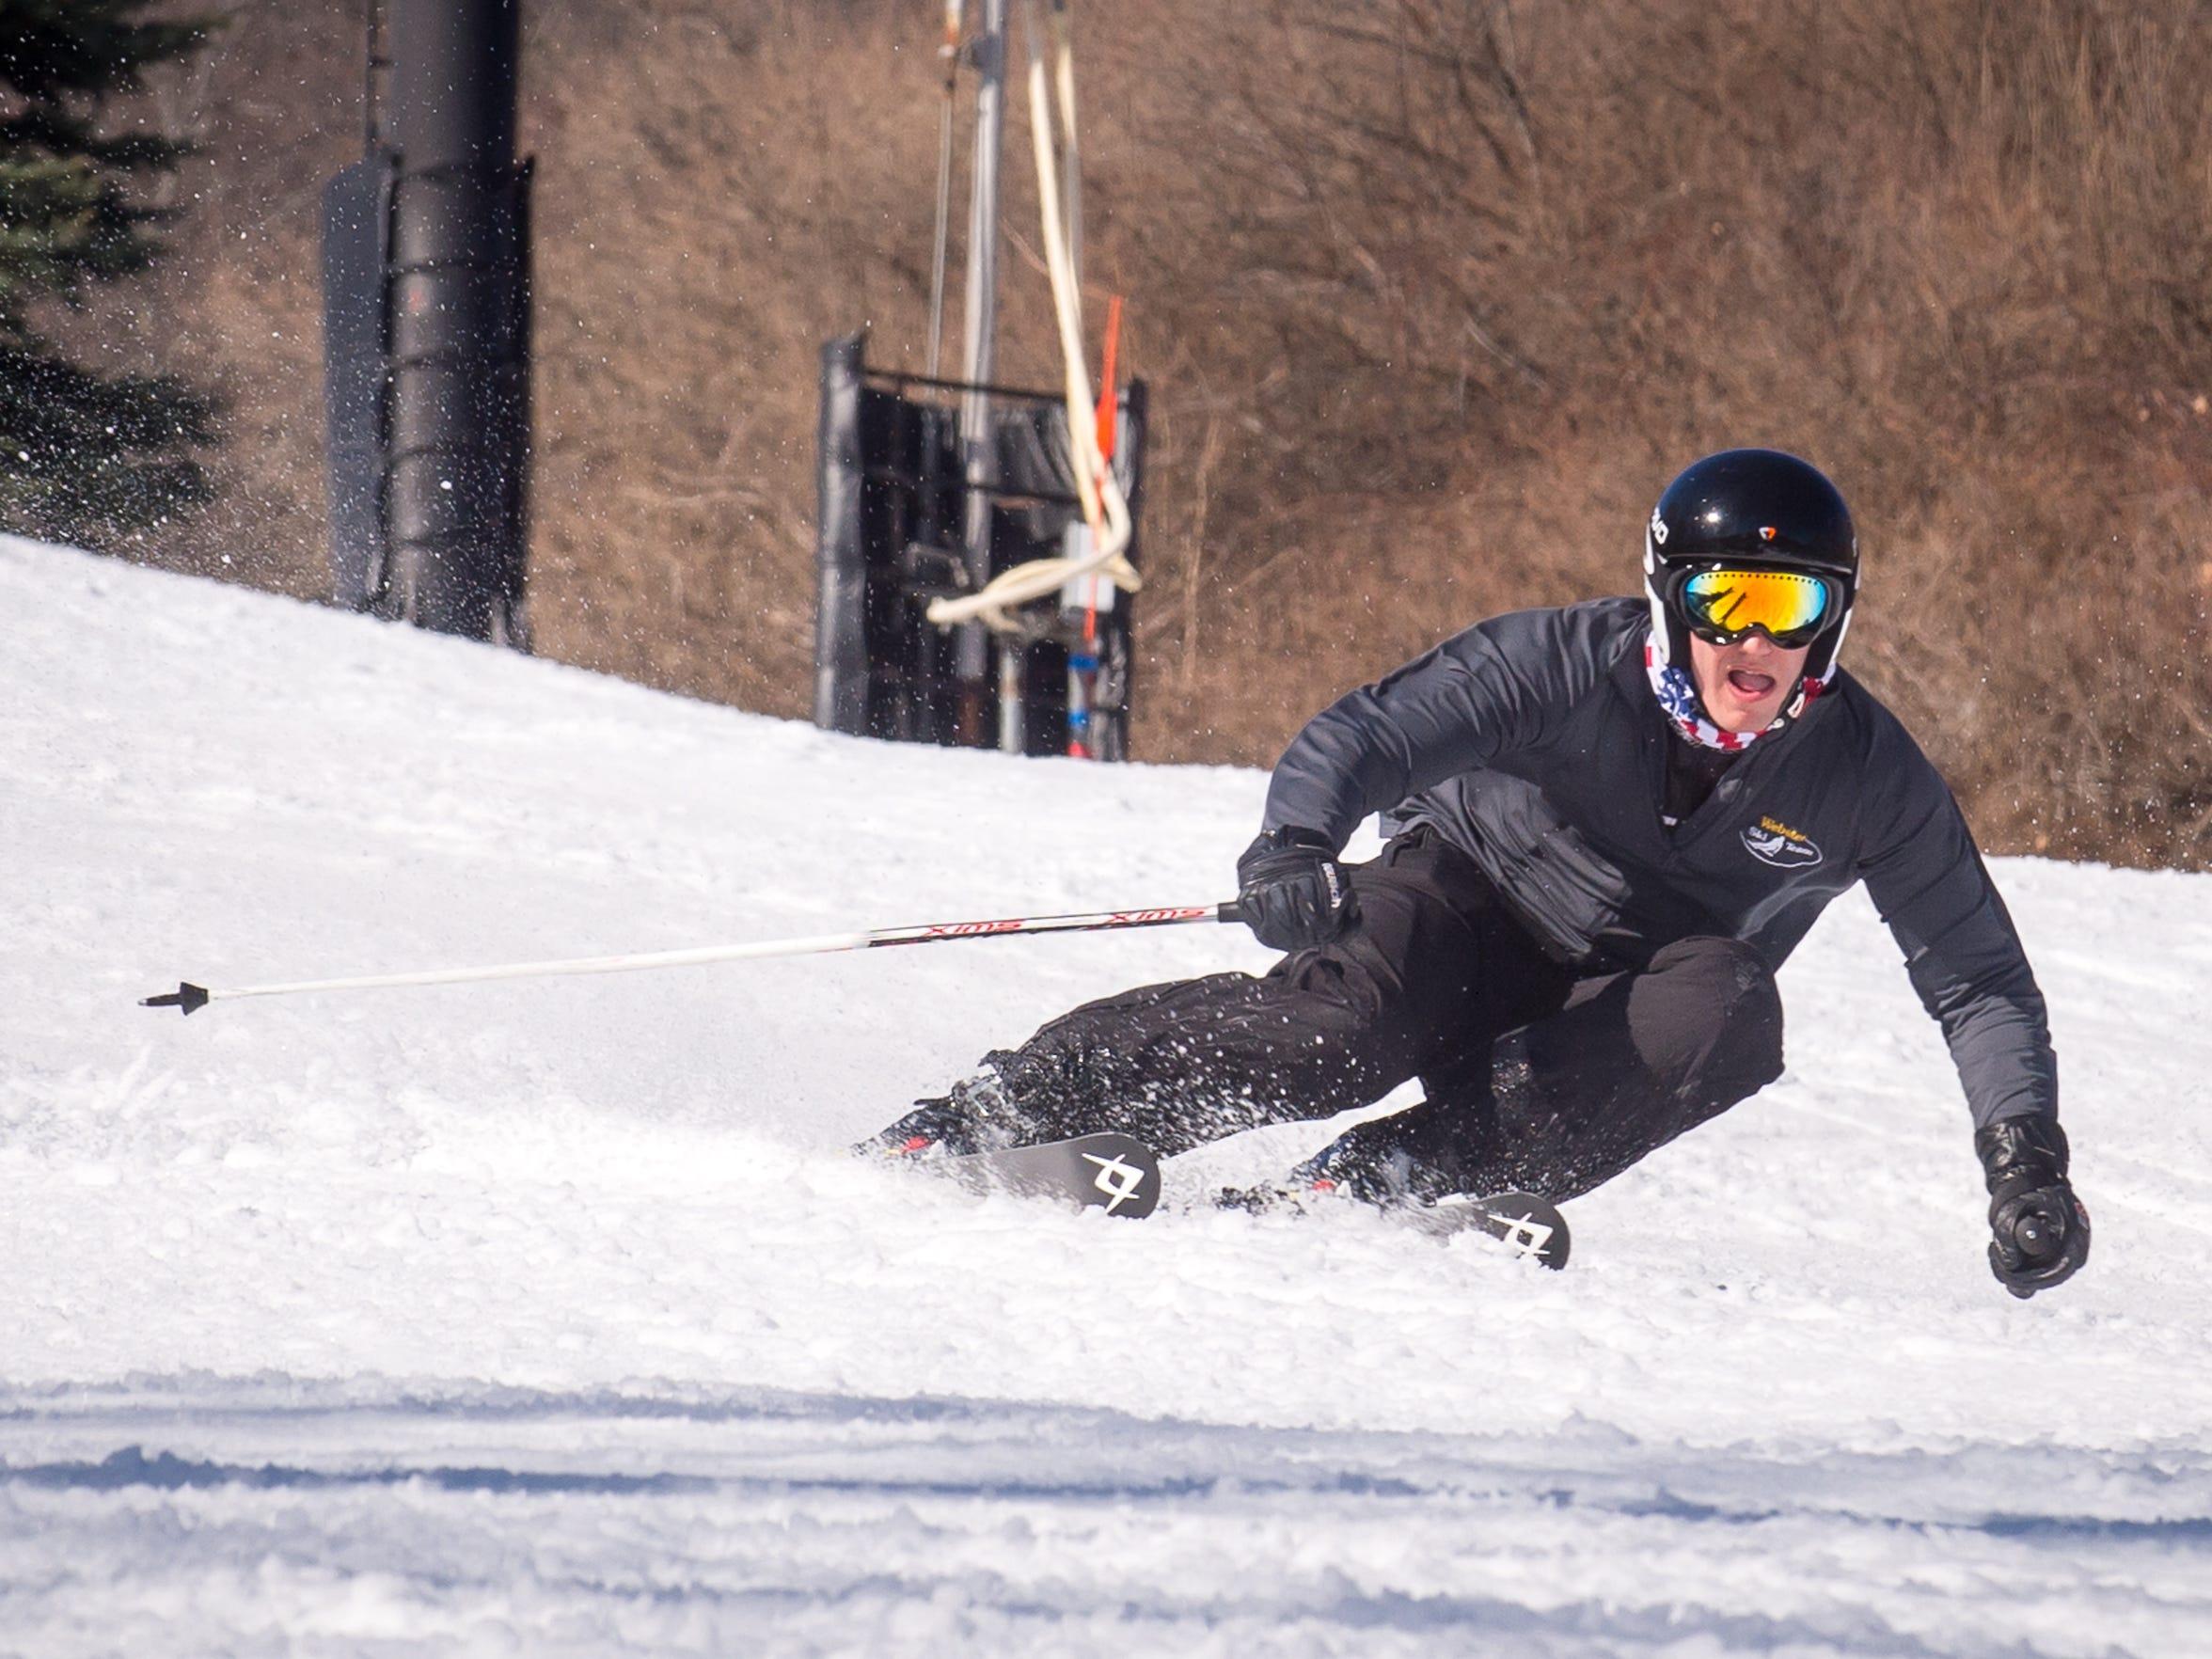 Webster Thomas senior Joe Vasile skis down one of the hills at Bristol Mountain on Feb 20.